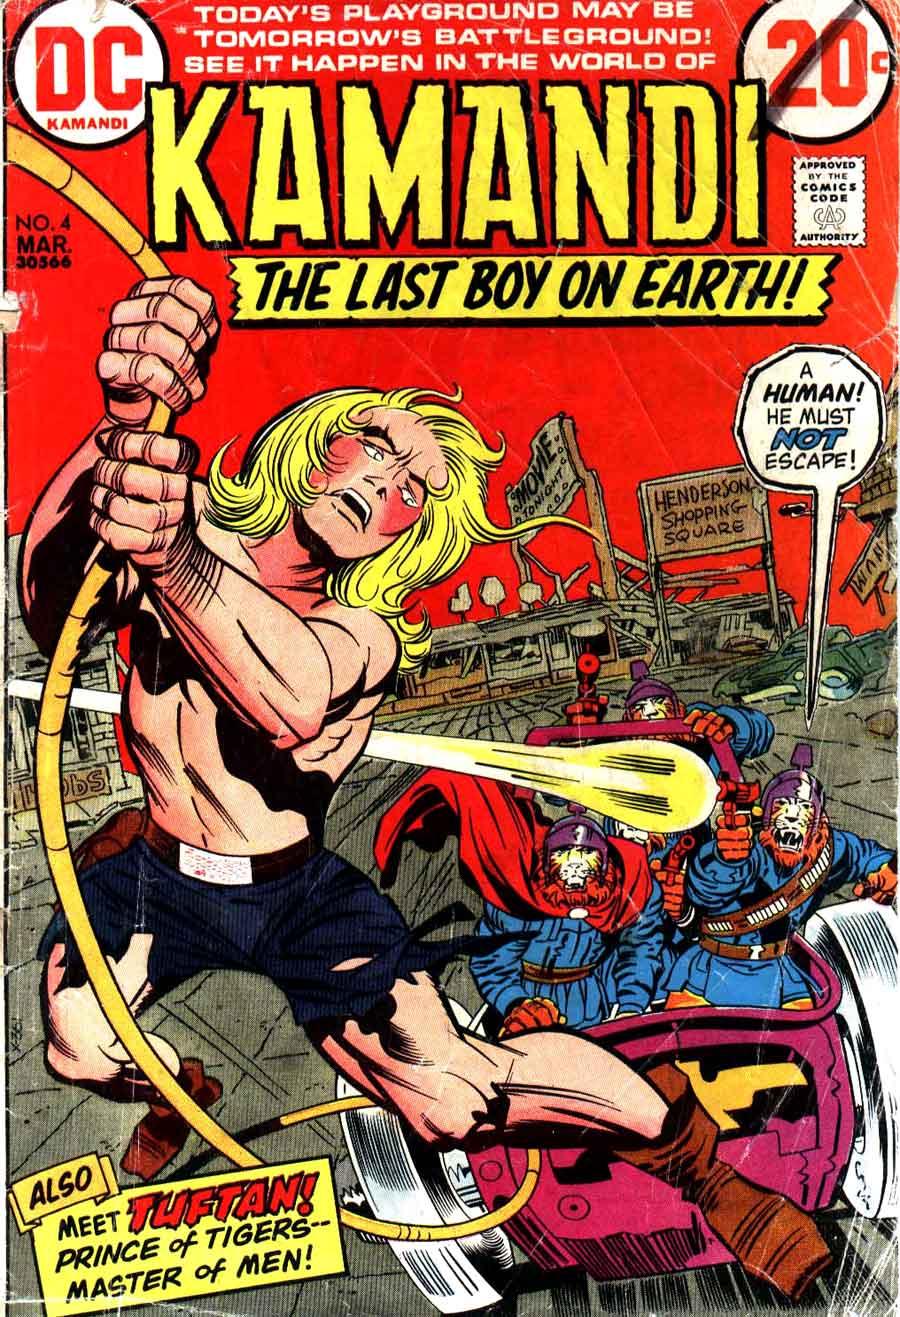 Kamandi v1 #4 dc 1970s bronze age comic book cover art by Jack Kirby